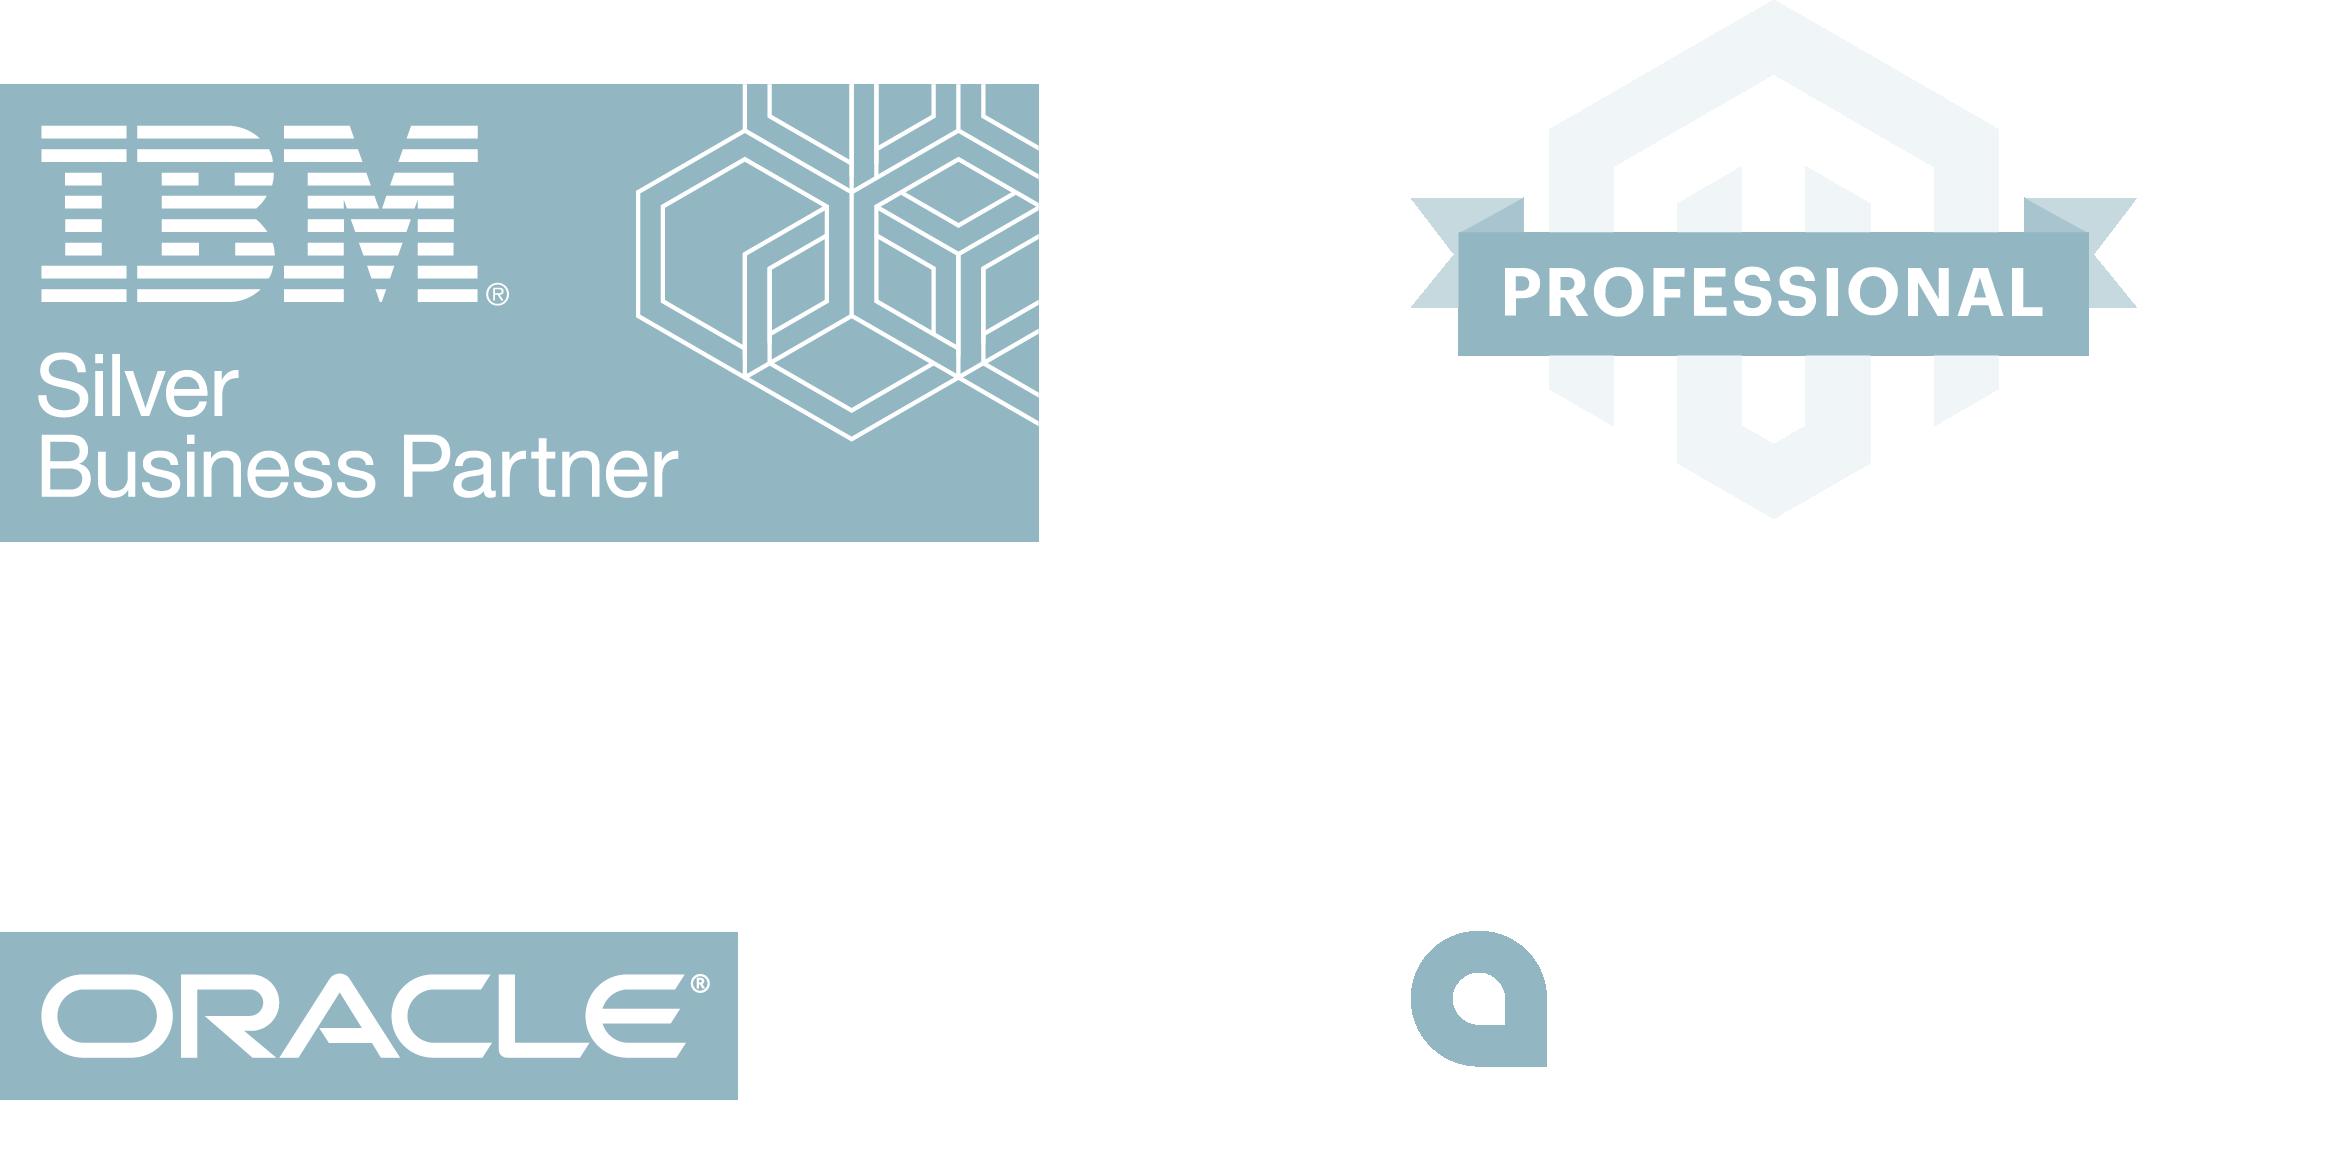 footer-logos-acumatica-oracle-ibmi-magento